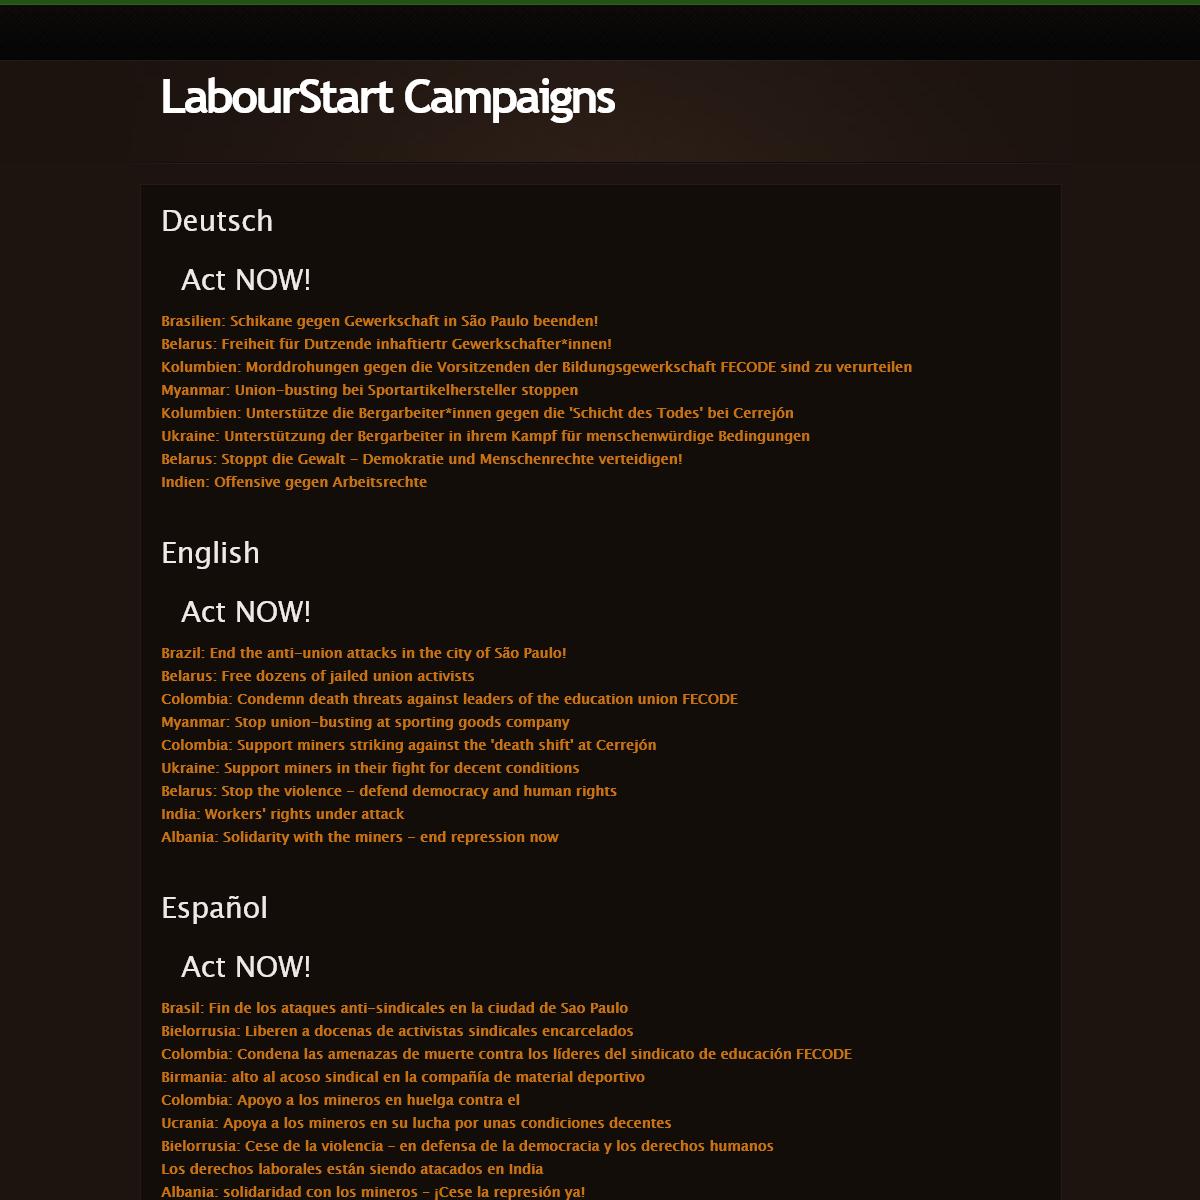 LabourStart Campaigns